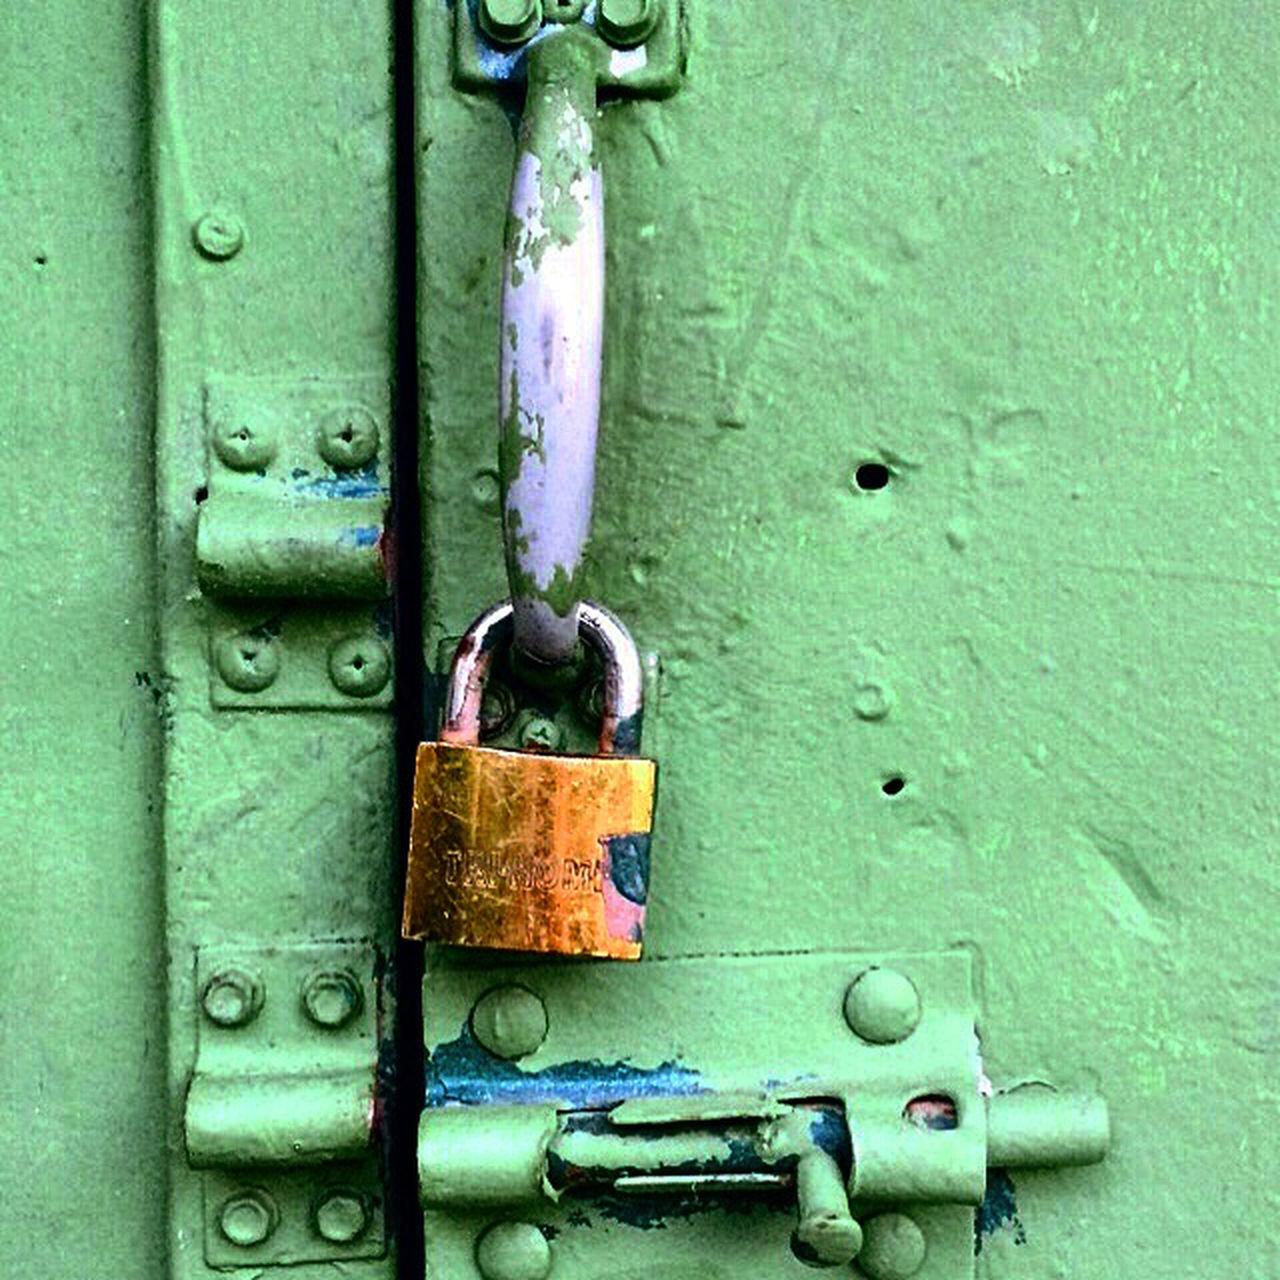 CLOSE-UP OF PADLOCKS ON RUSTY DOOR